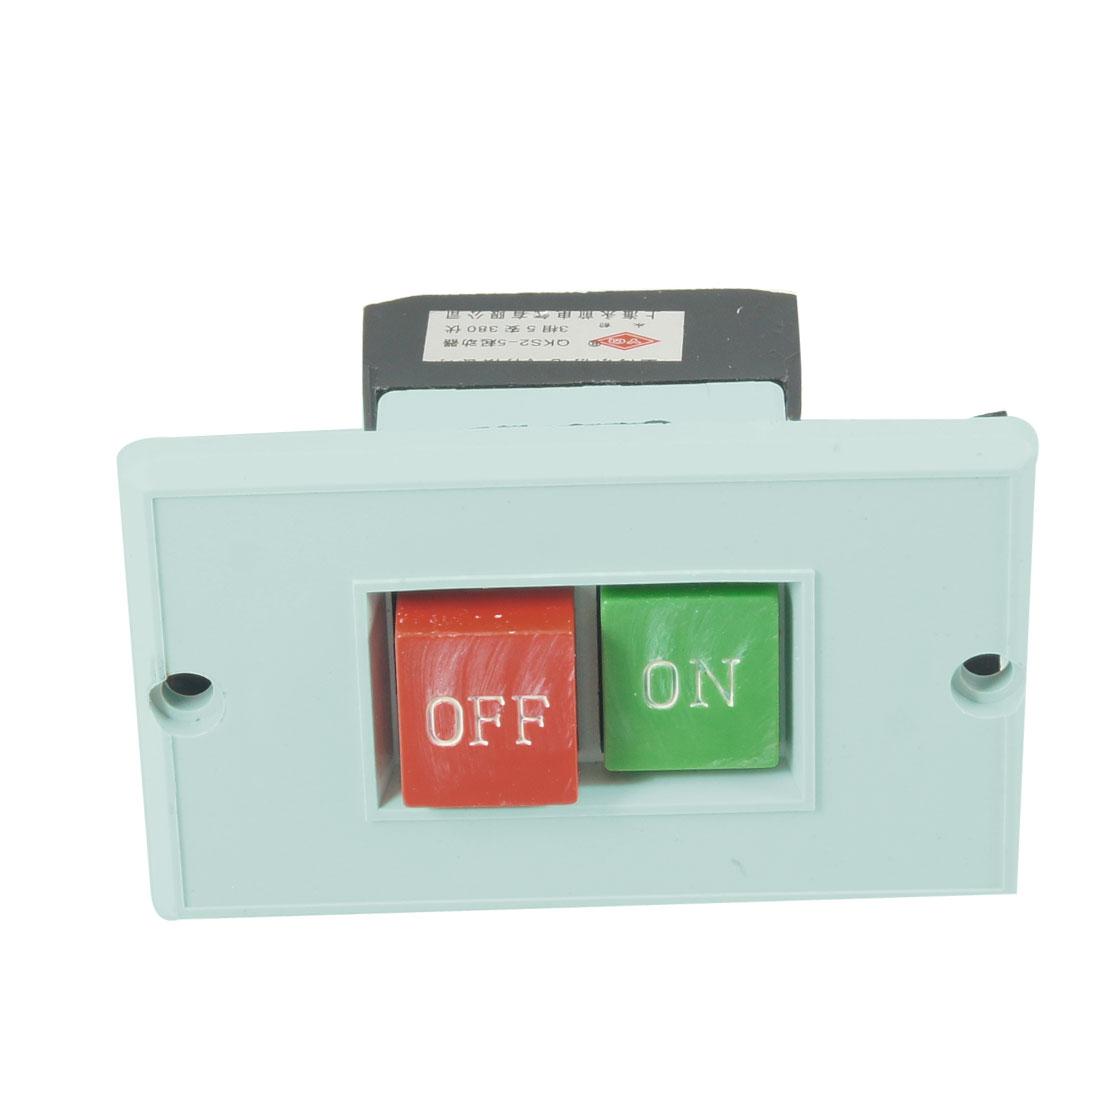 AC380V 5A Cutting Machine On/Off Push Button Switch QKS2-5